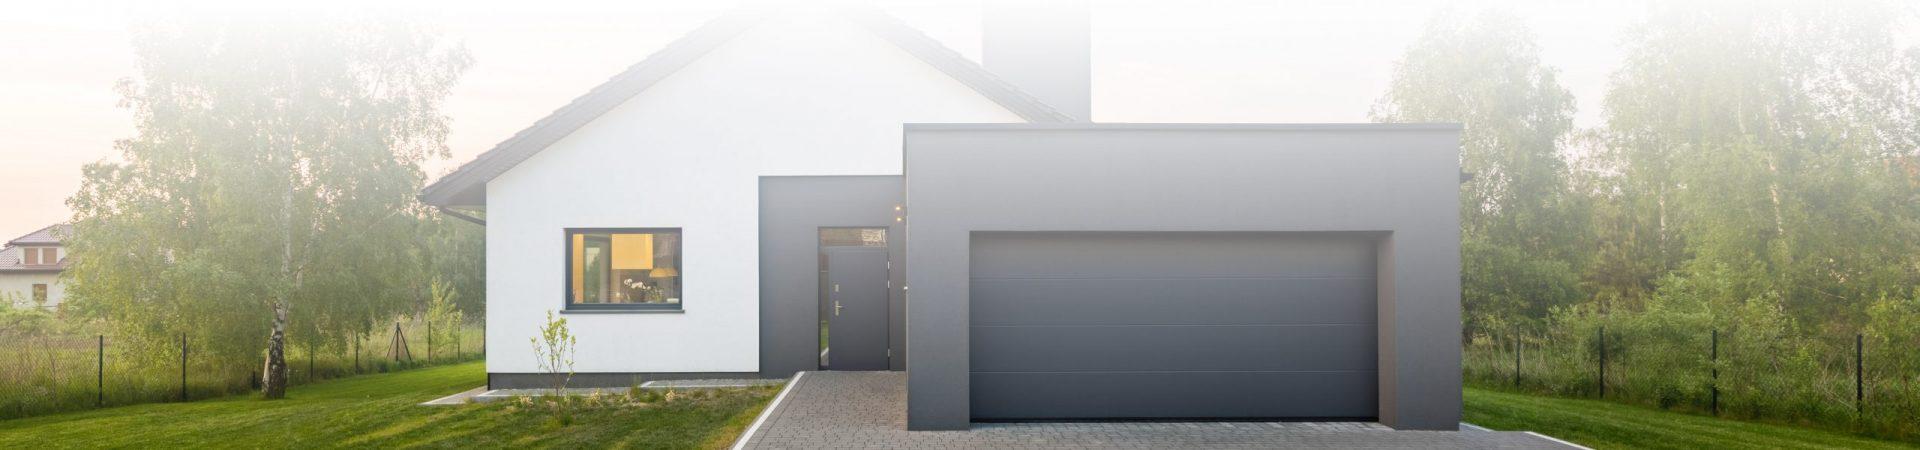 AG Design Toronto Architect Firm - Modern Garage